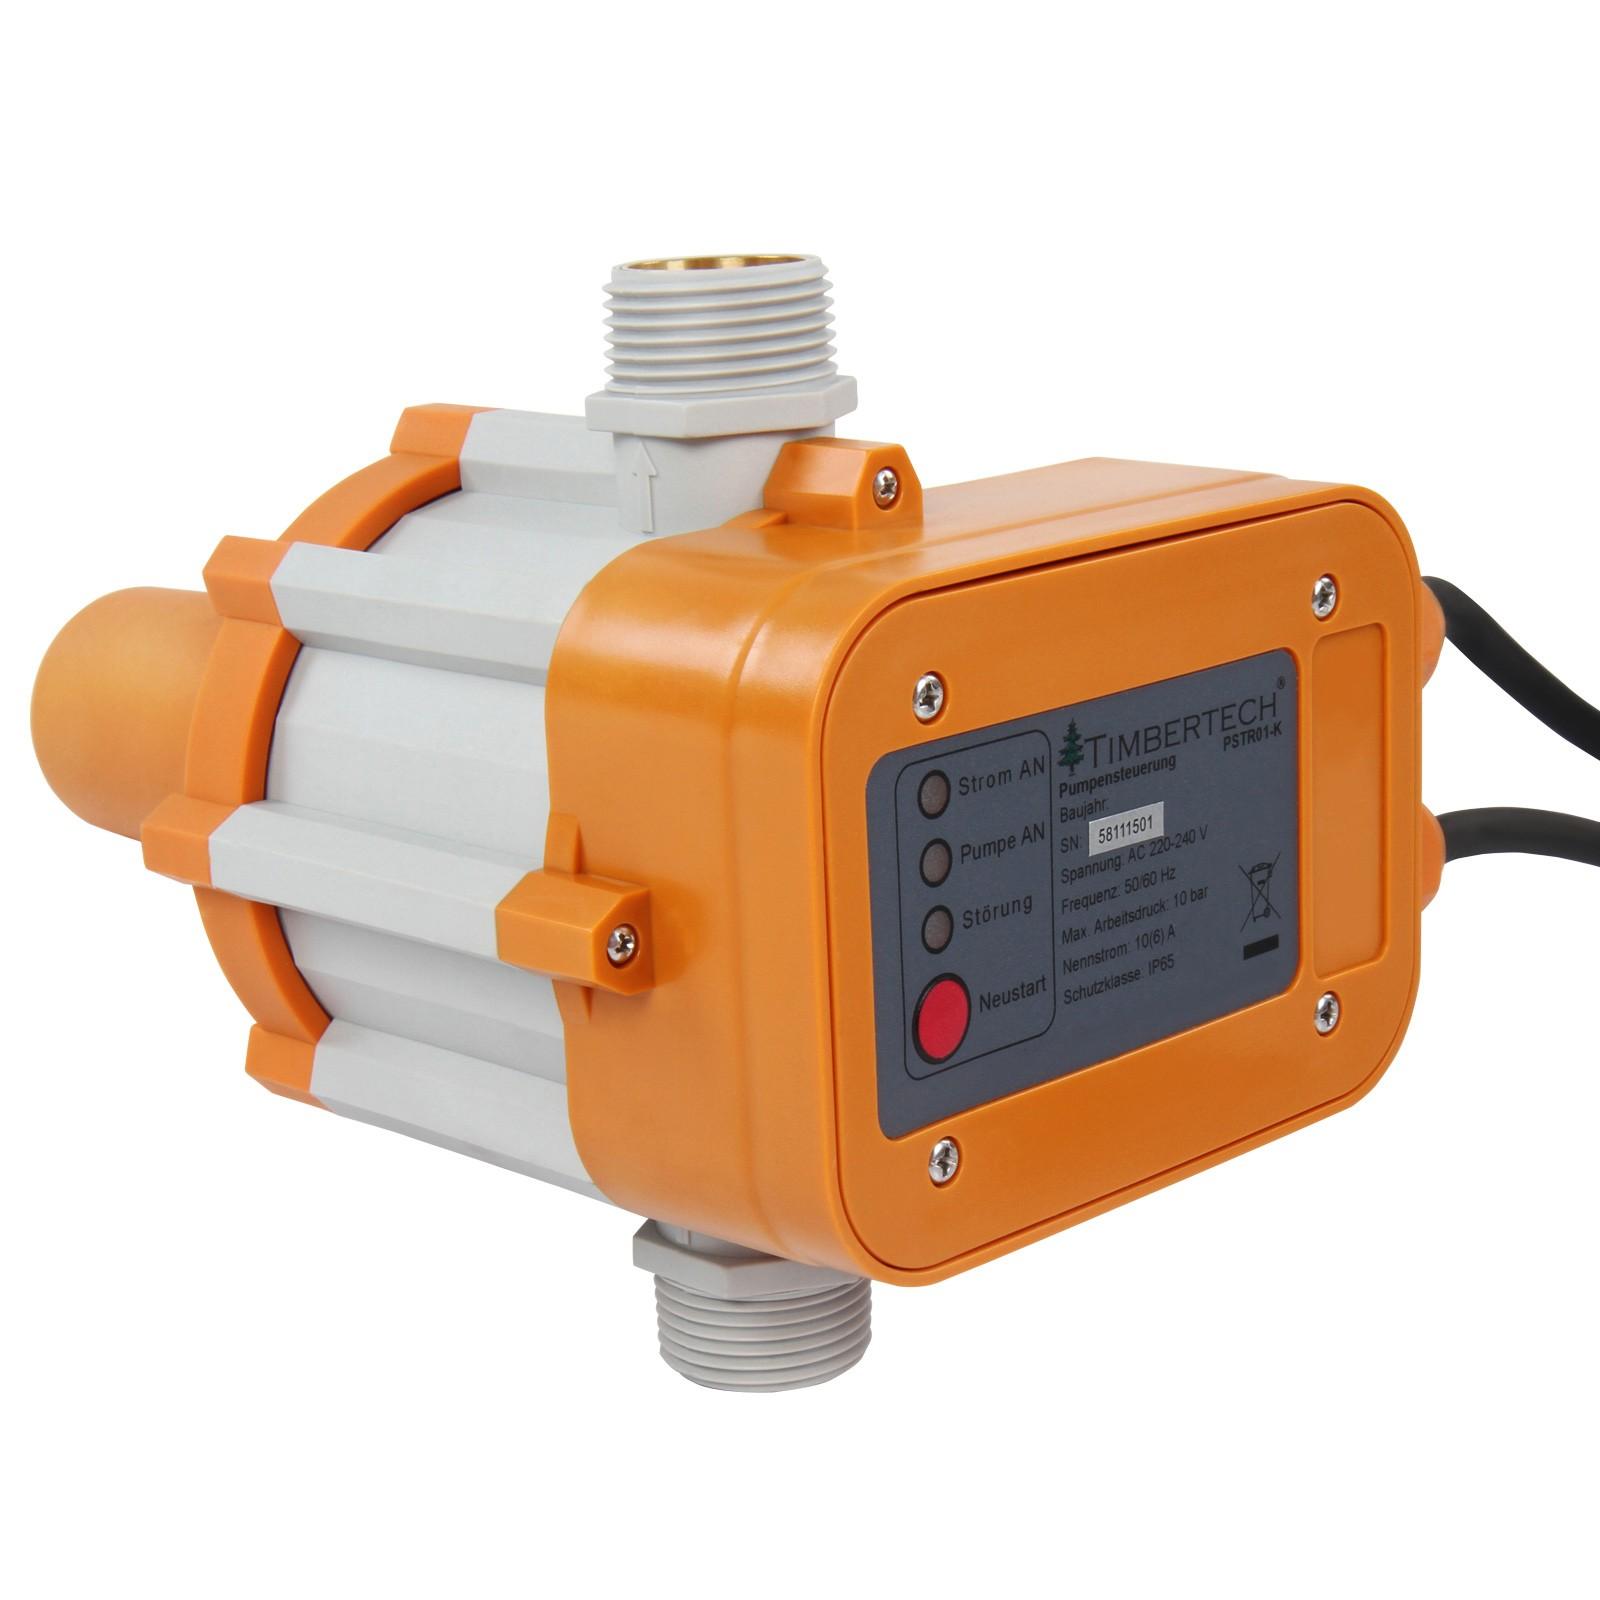 Bombas de control con cable 12v interruptor de presión para druckwächter casa obra de agua